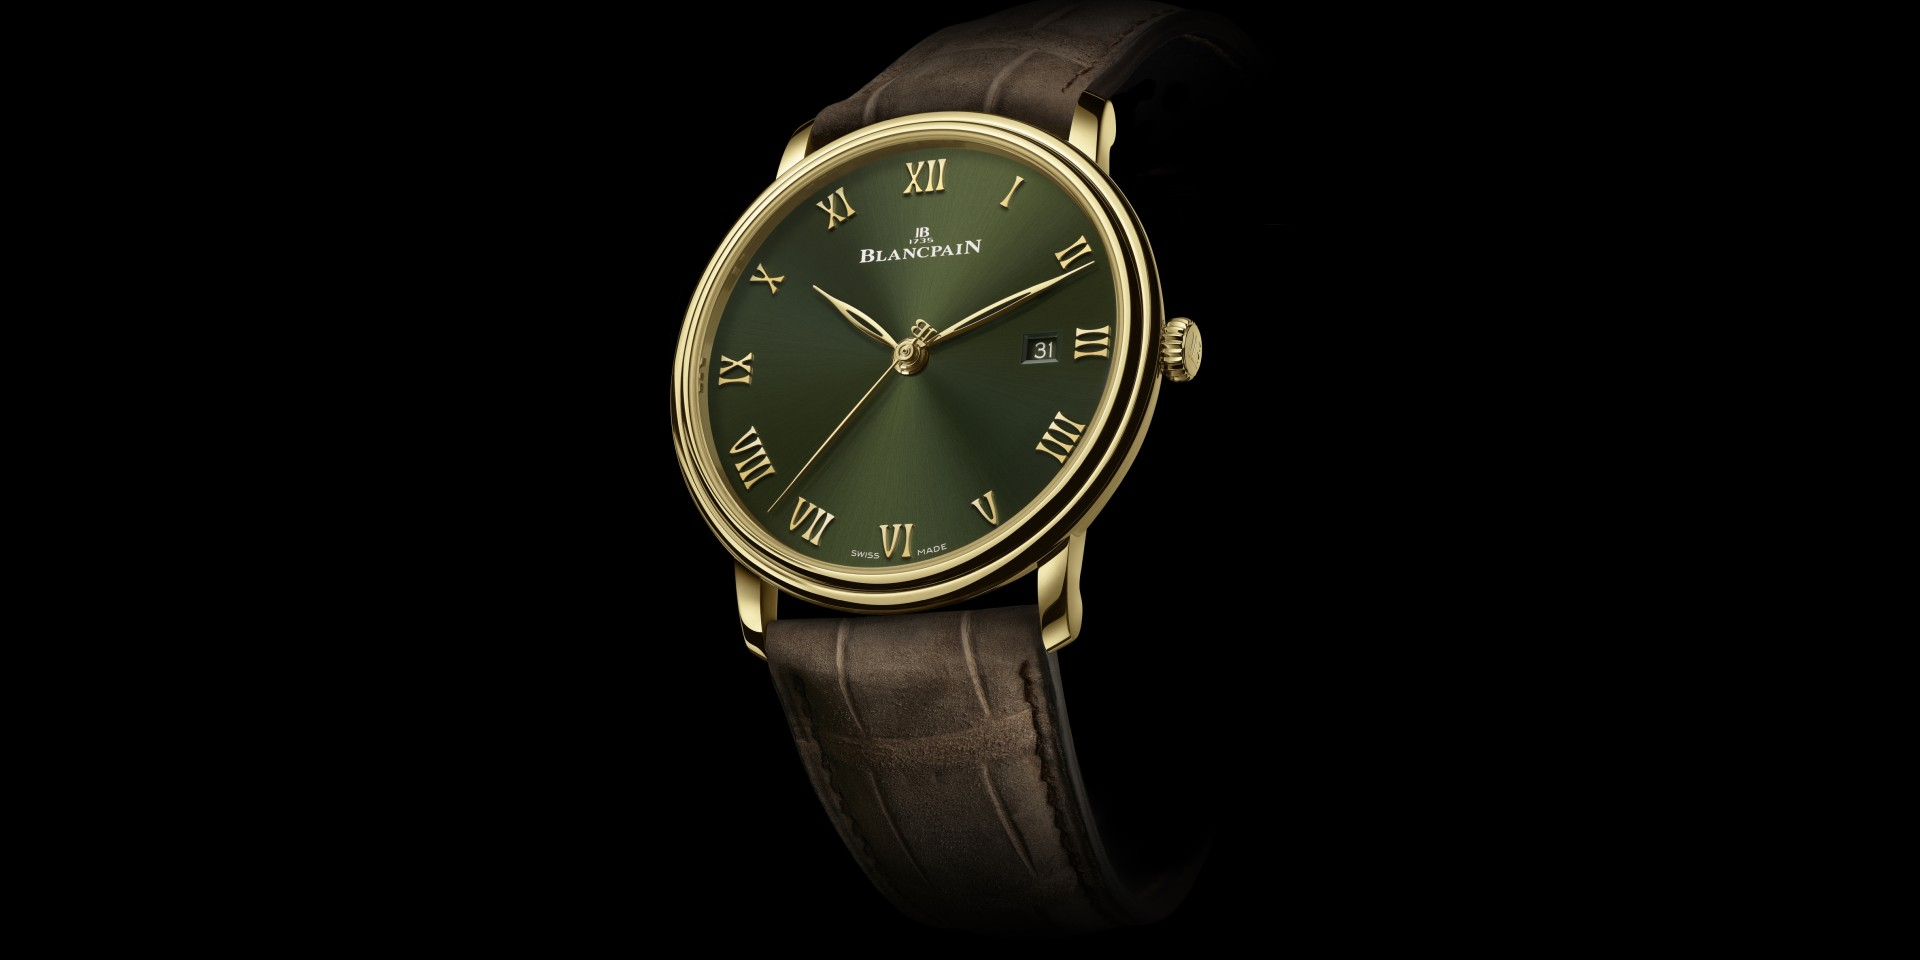 BLANCPAIN推出全新Villeret超薄錶專門店限定款,首度採用綠色錶盤